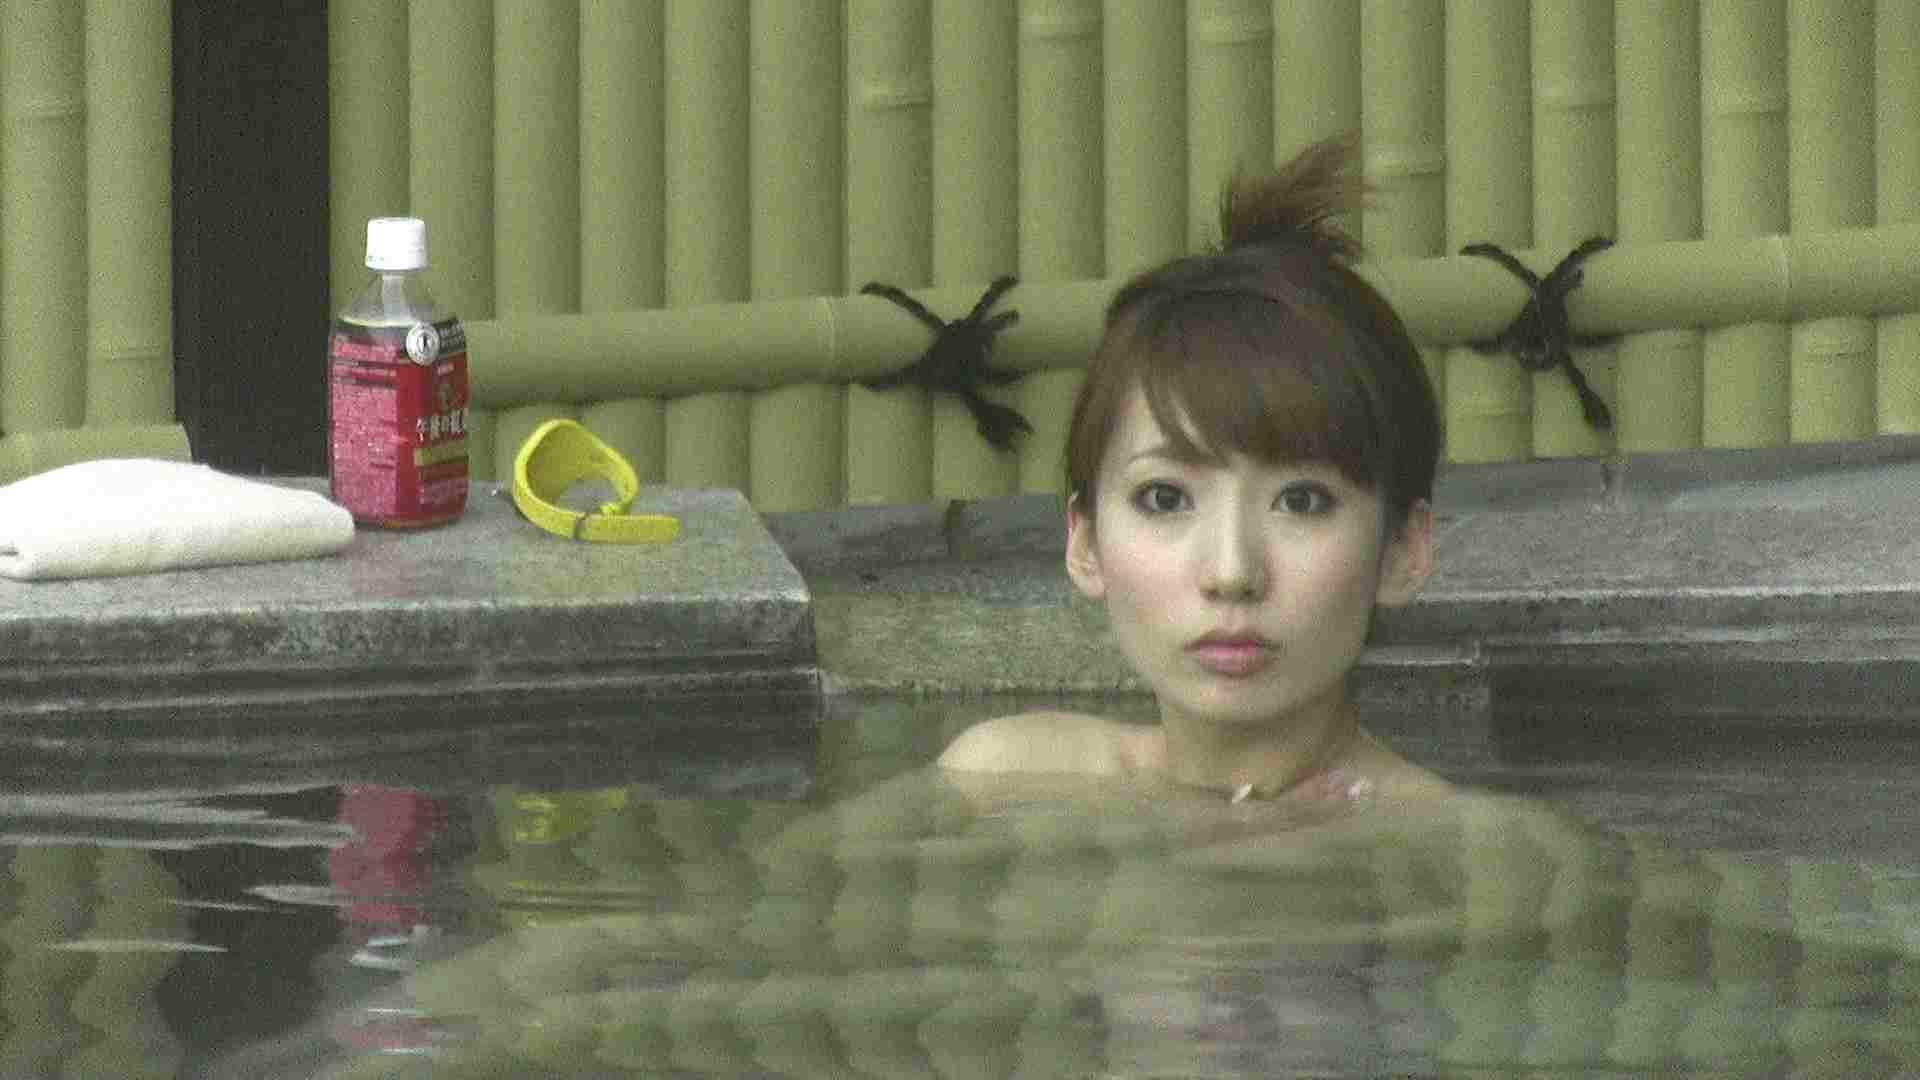 Aquaな露天風呂Vol.208 HなOL   盗撮  101pic 25